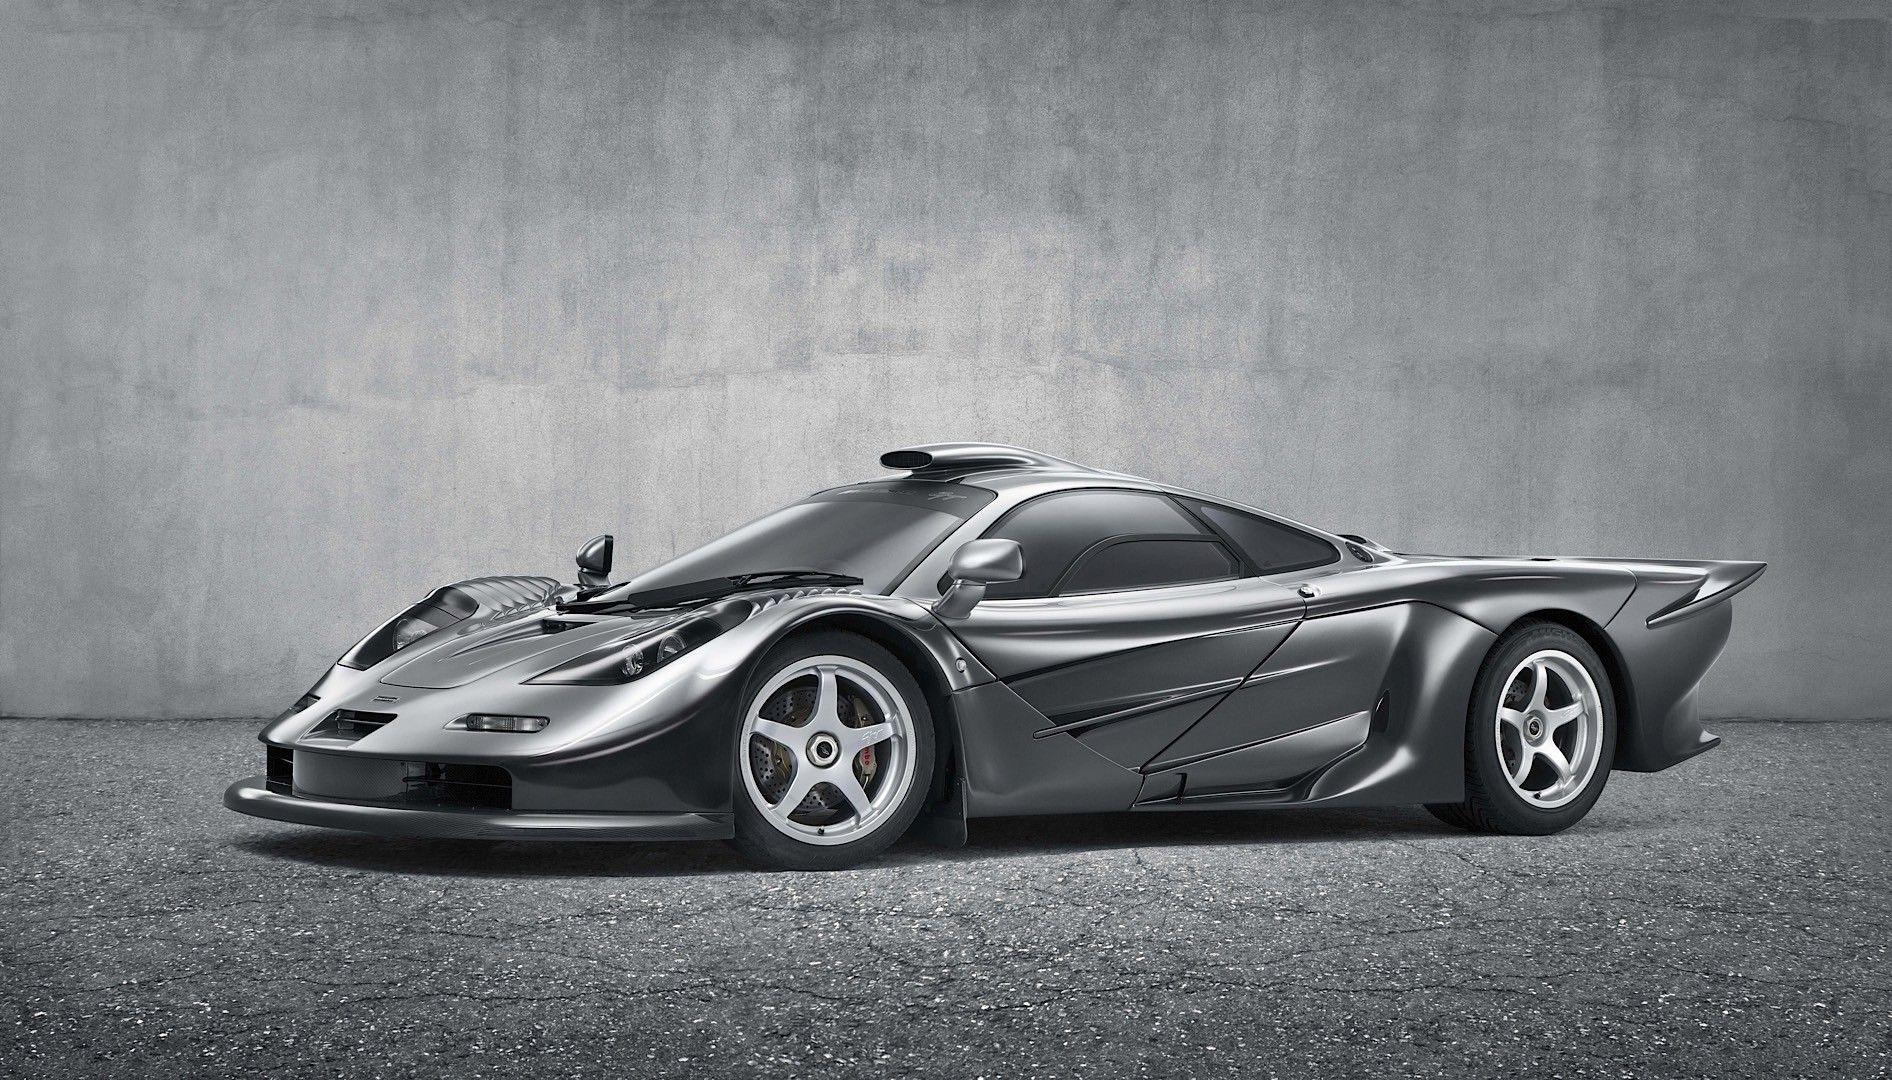 Mclaren Brings Alain Prost Inspired P1 And F1 Gt To Goodwood Photo Gallery Mclaren Cars Mclaren F1 Super Cars